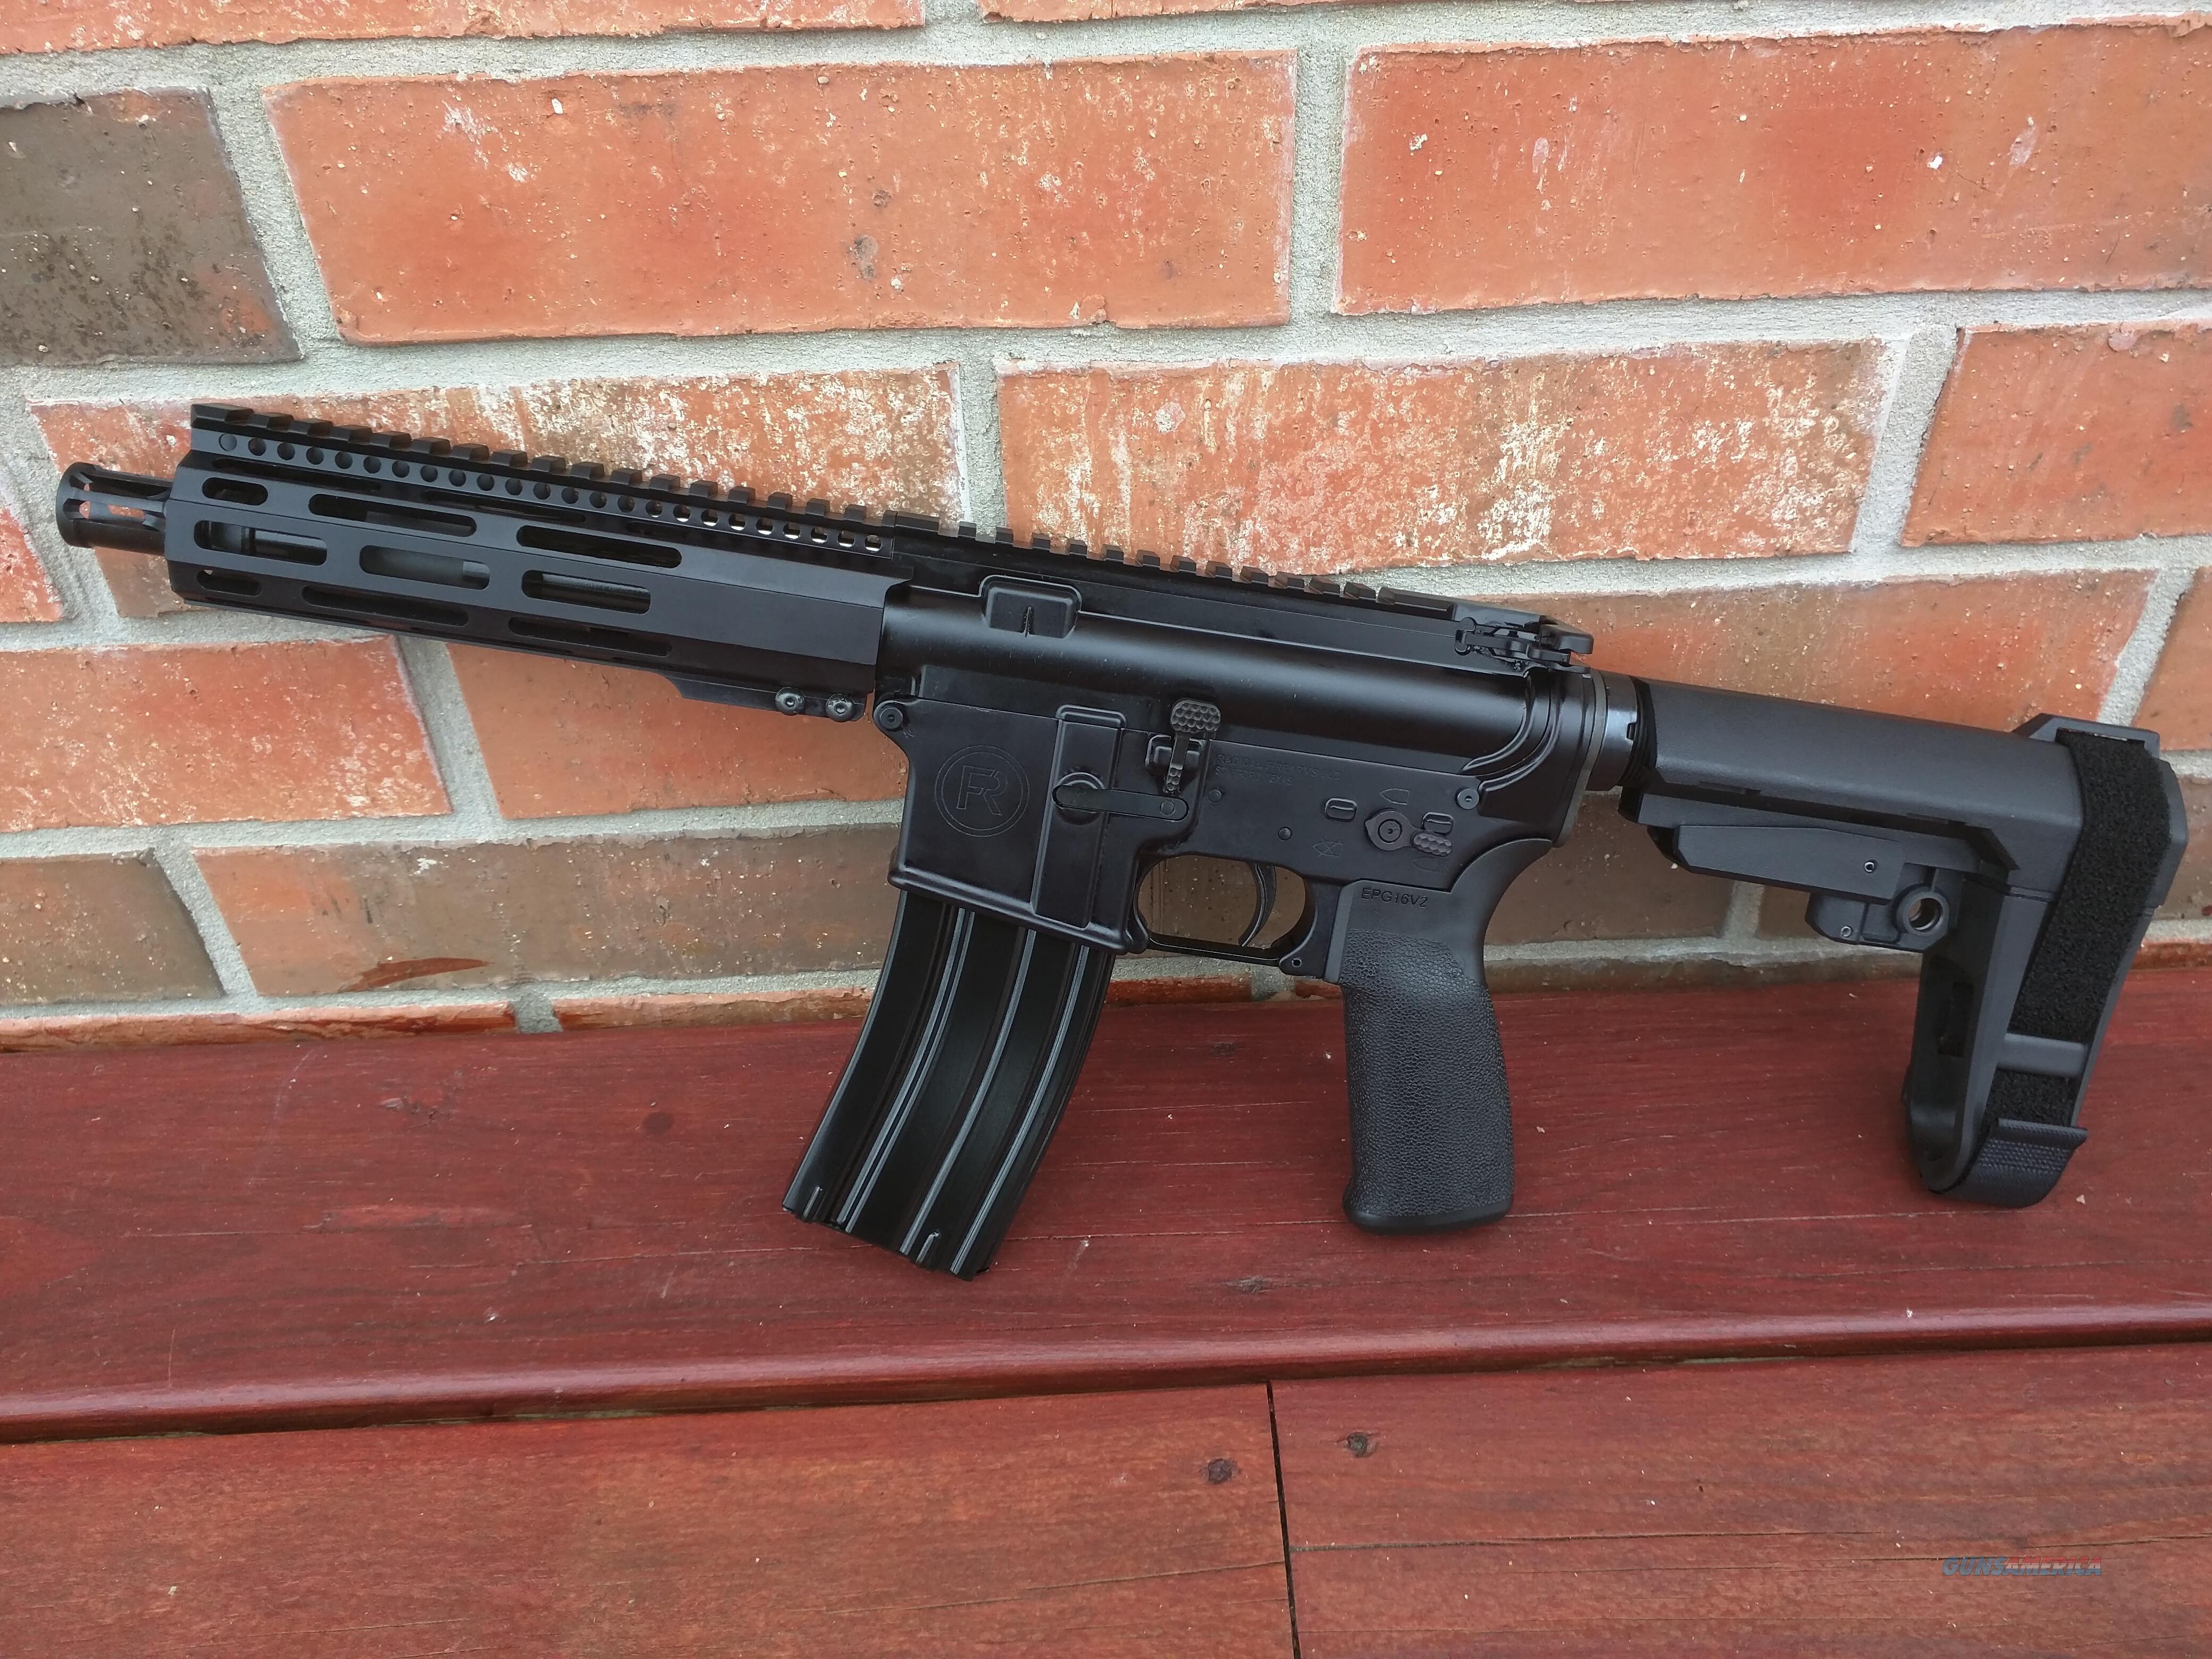 "Radical Firearms AR15 AR 15 Pistol 5.56/223 7.5"" SB Tactical SBA3 Adj. Pistol Brace Alum. Hand Guard FREE LAYAWAY!!  Guns > Rifles > AR-15 Rifles - Small Manufacturers > Complete Rifle"